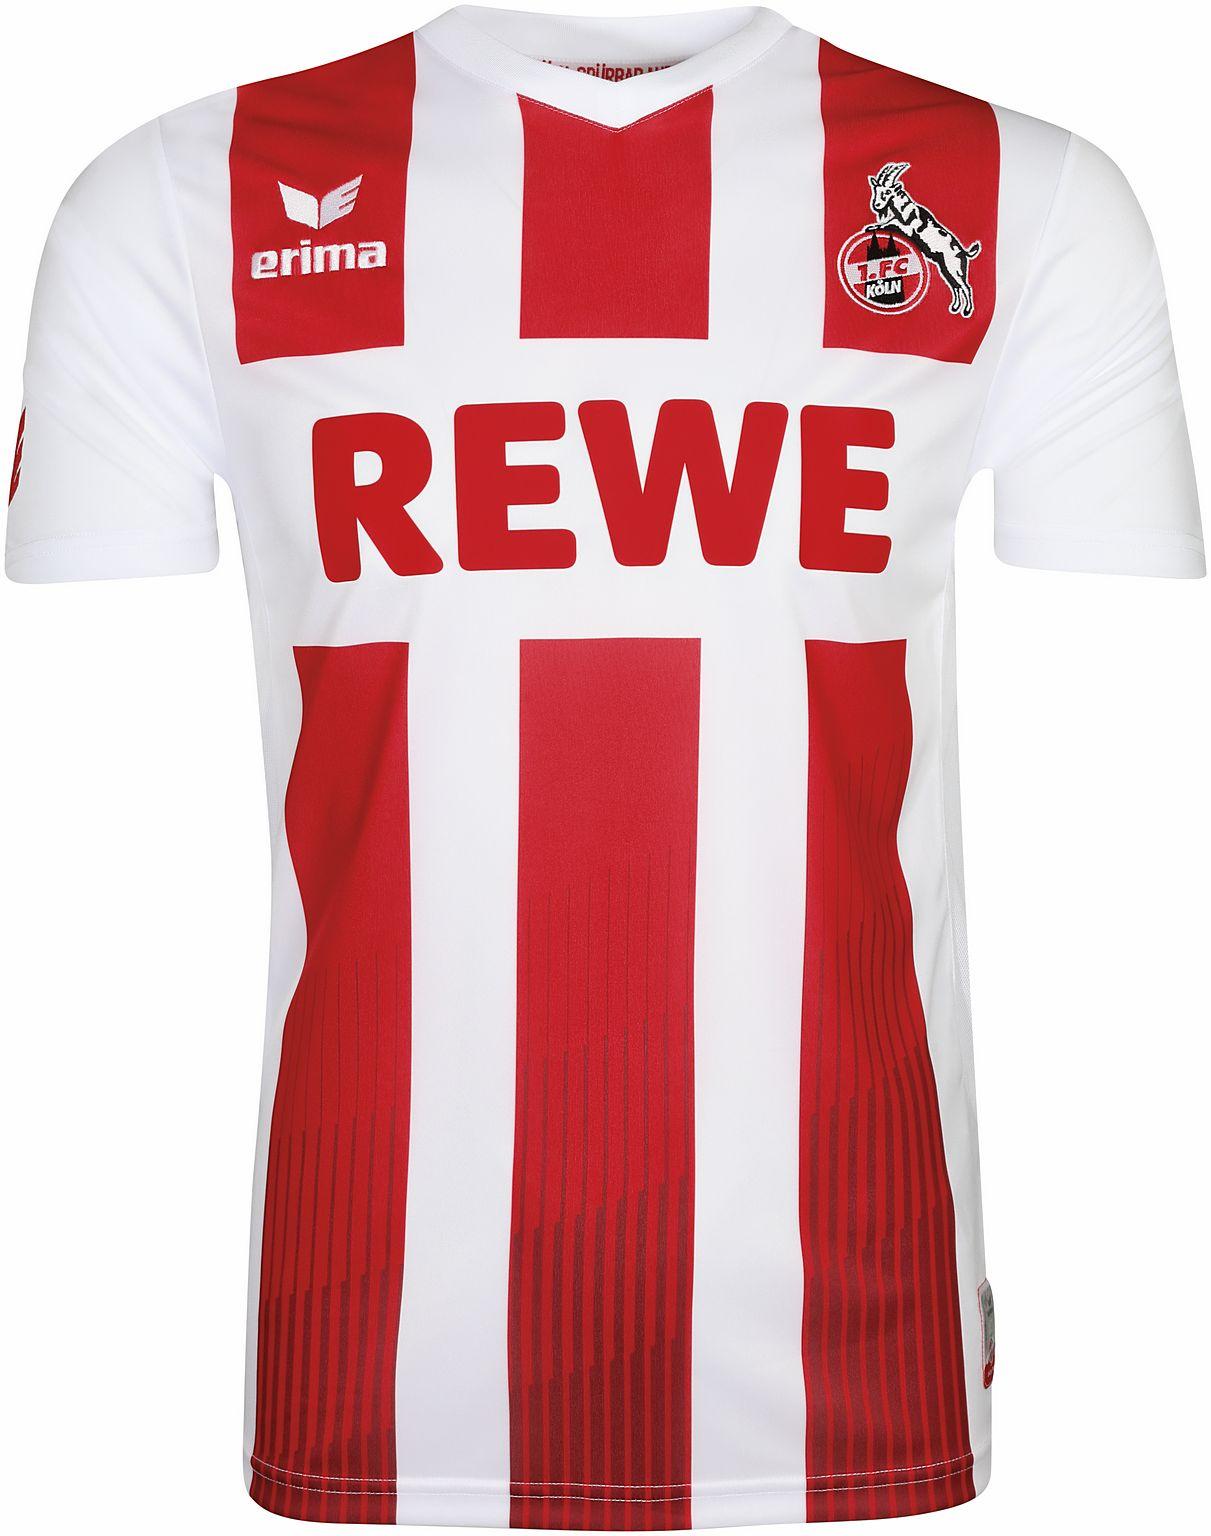 Erima 1. FC Köln Herren Heimtrikot 17/18 - 3130714